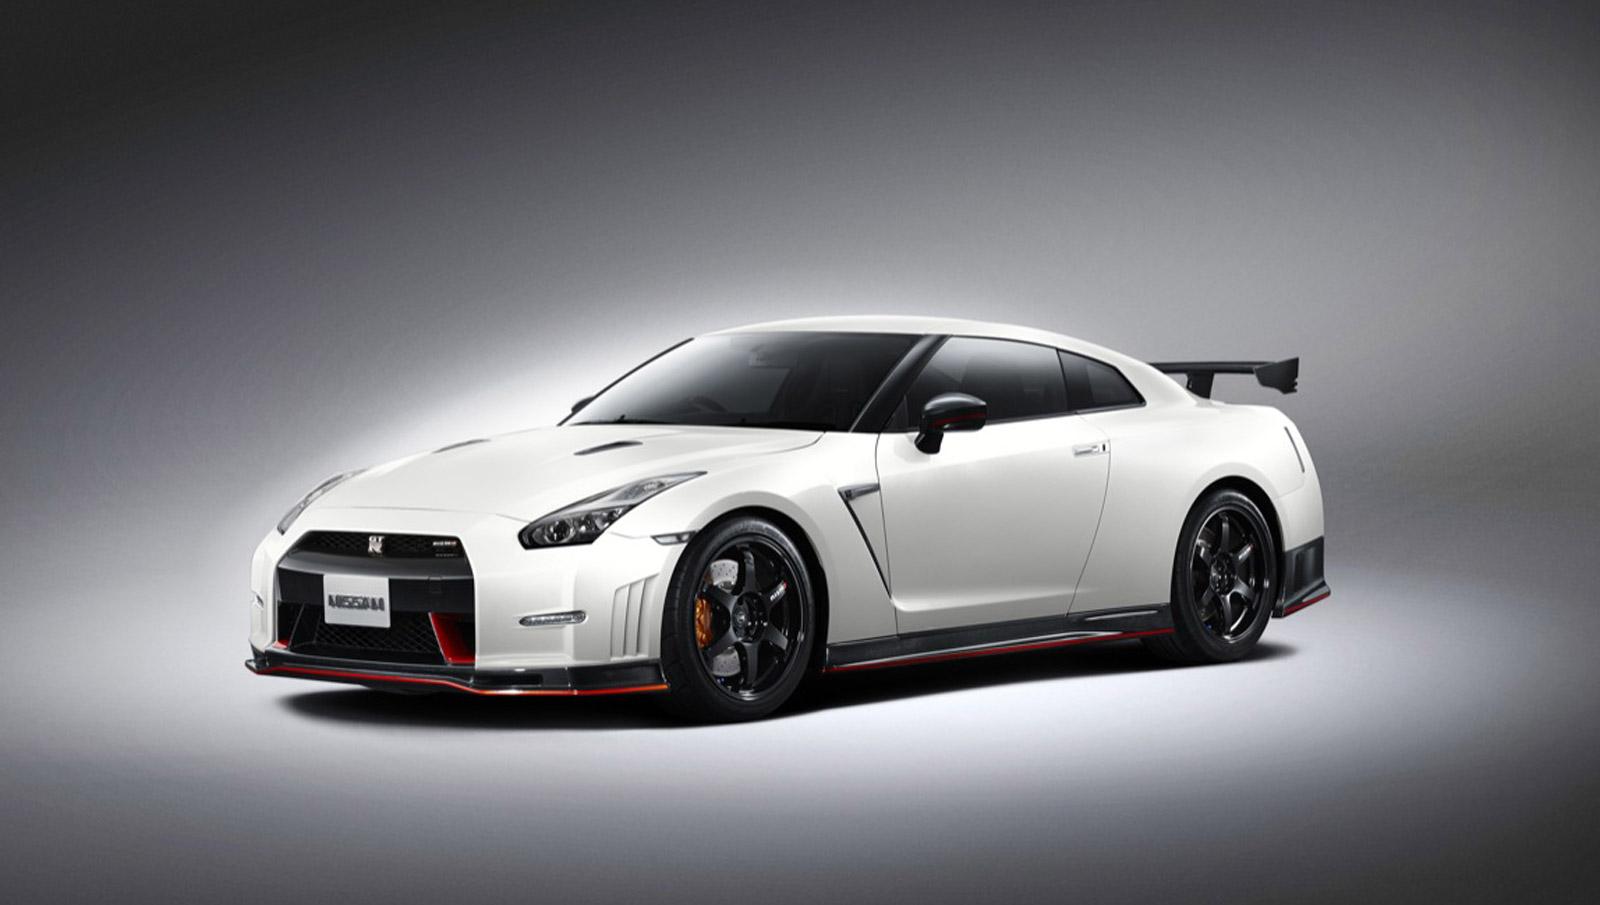 Nissan GT-R 2015 NISMO Version